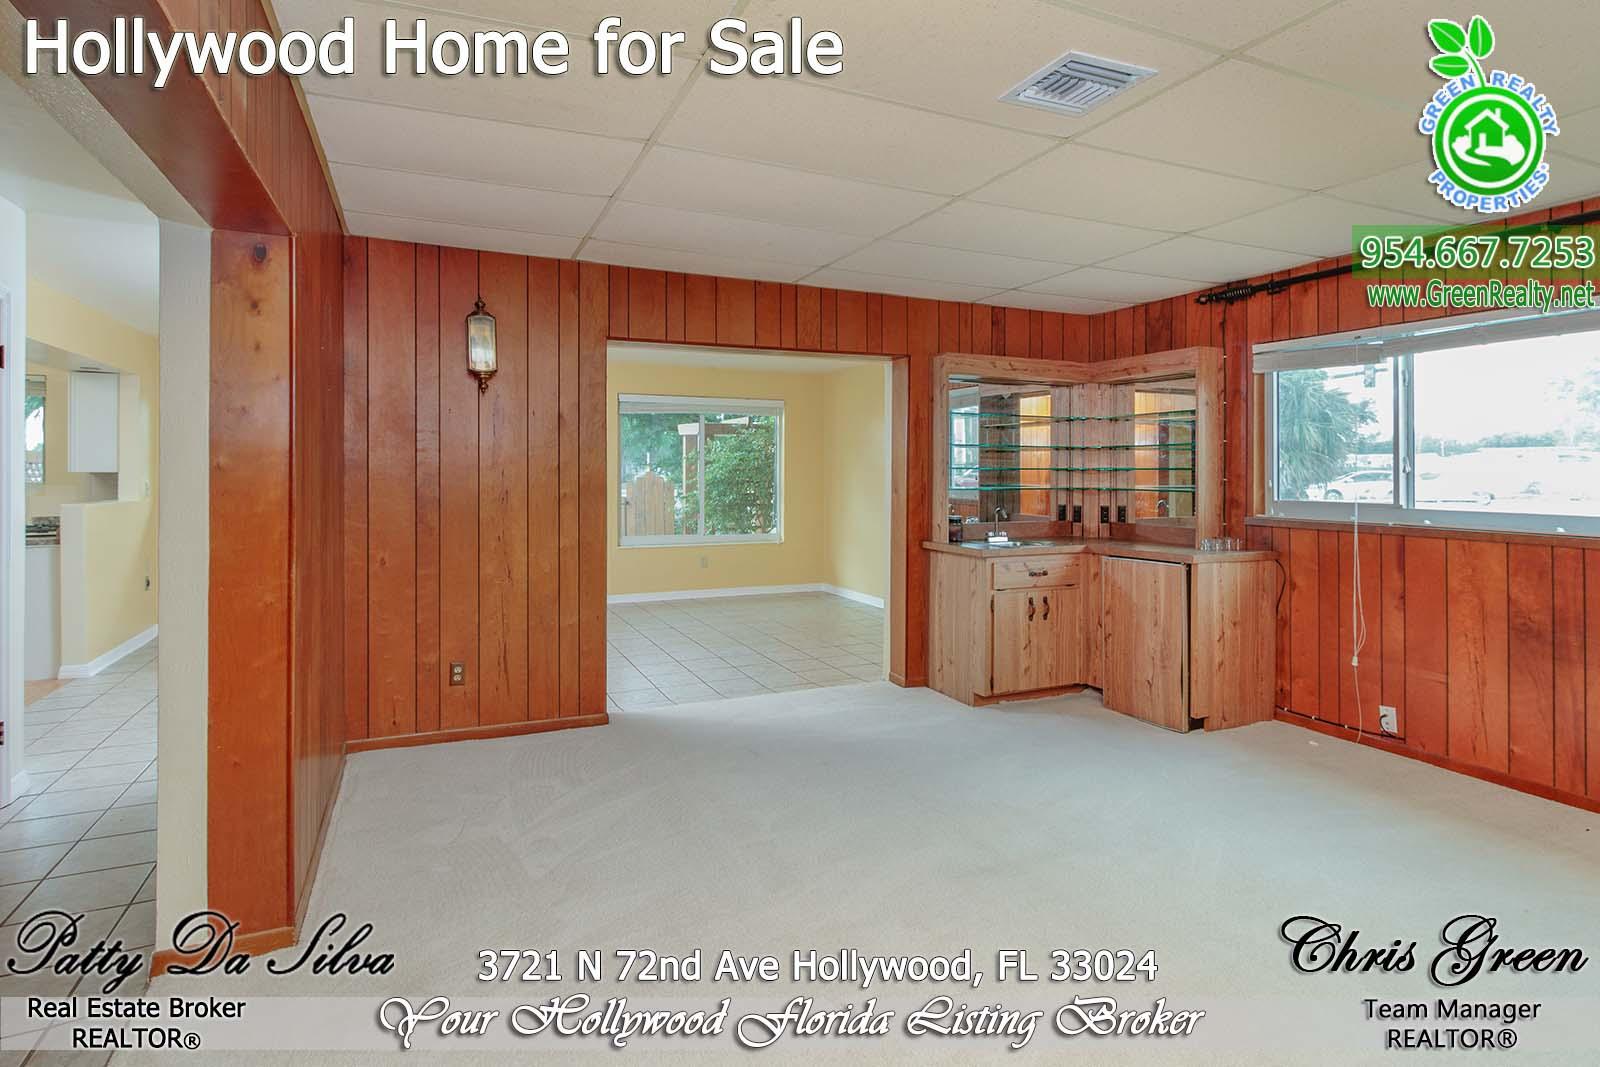 14 Hollywood Florida Real Estate Listing Patty Da Silva Green Realty properties (11)